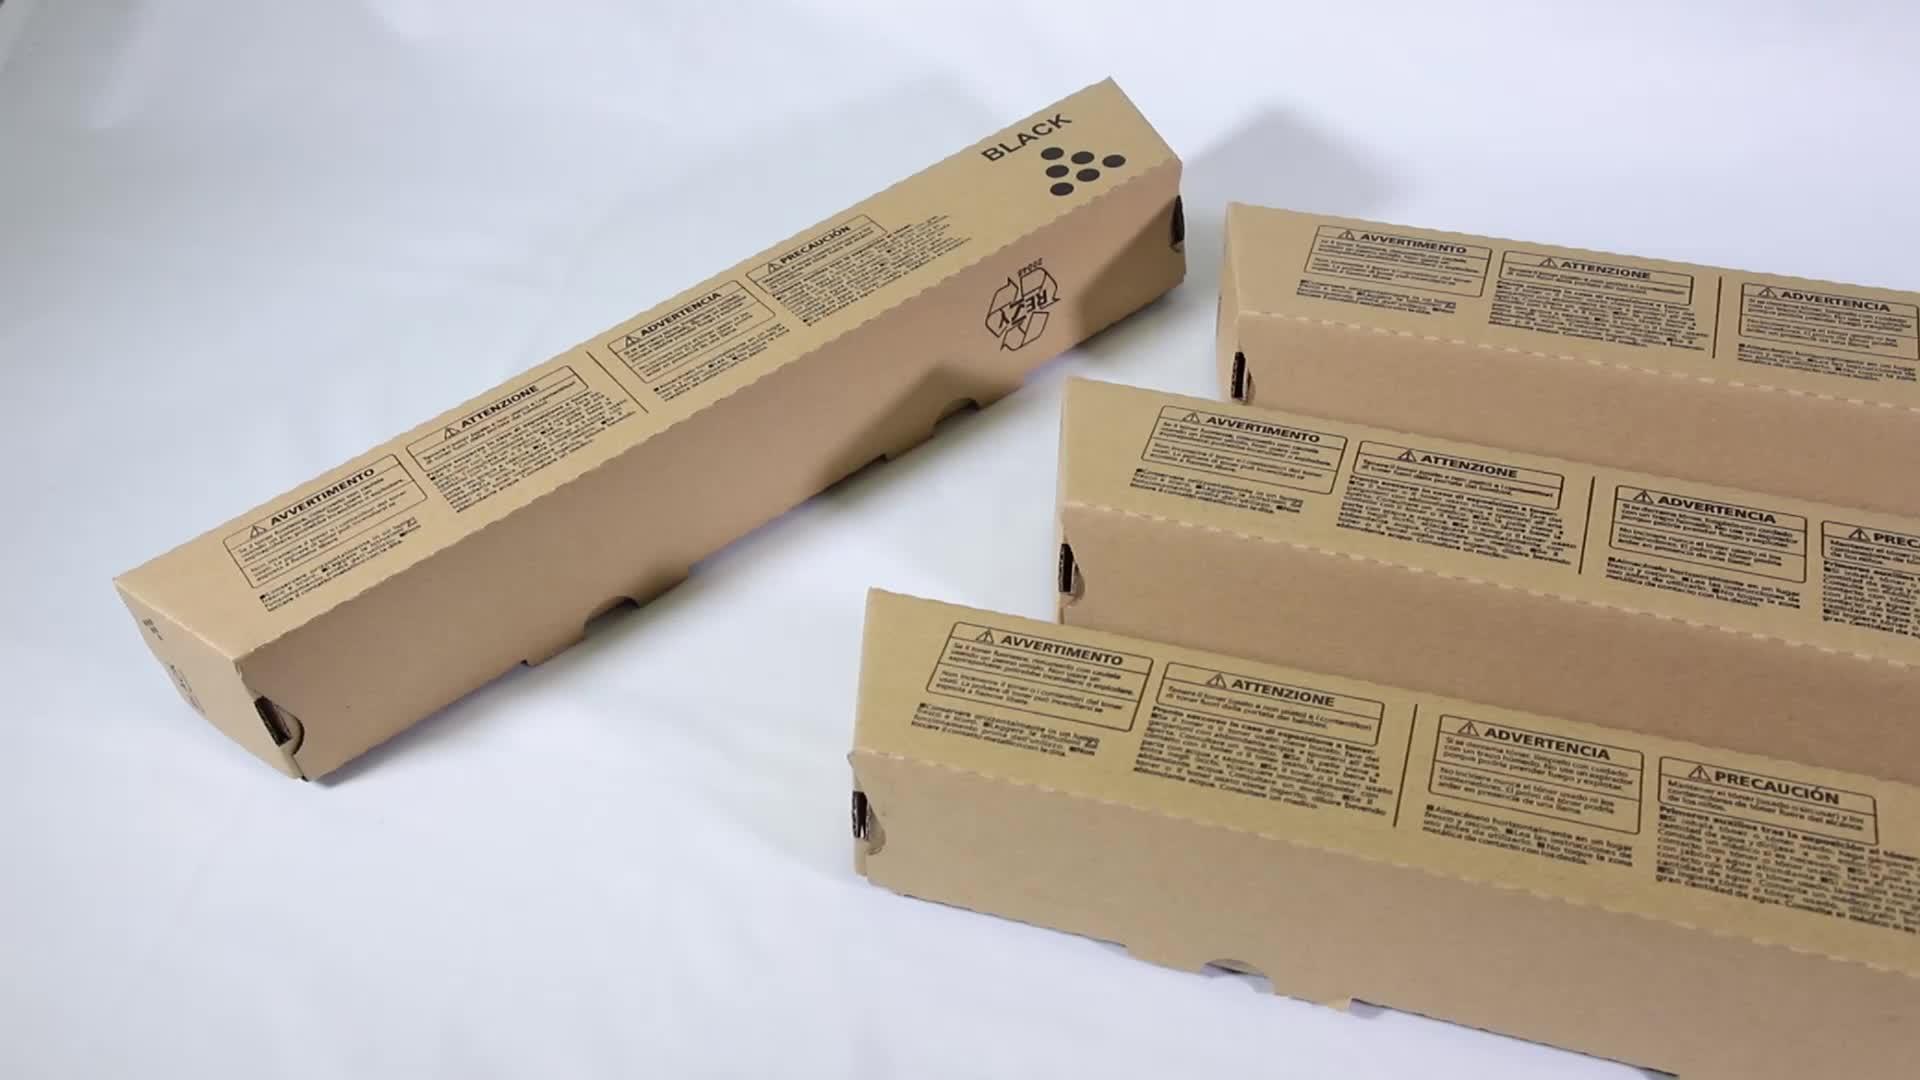 ASTA Premium farbe Toner TN216 für Konica Minolta Bizhub C280 C360 C220